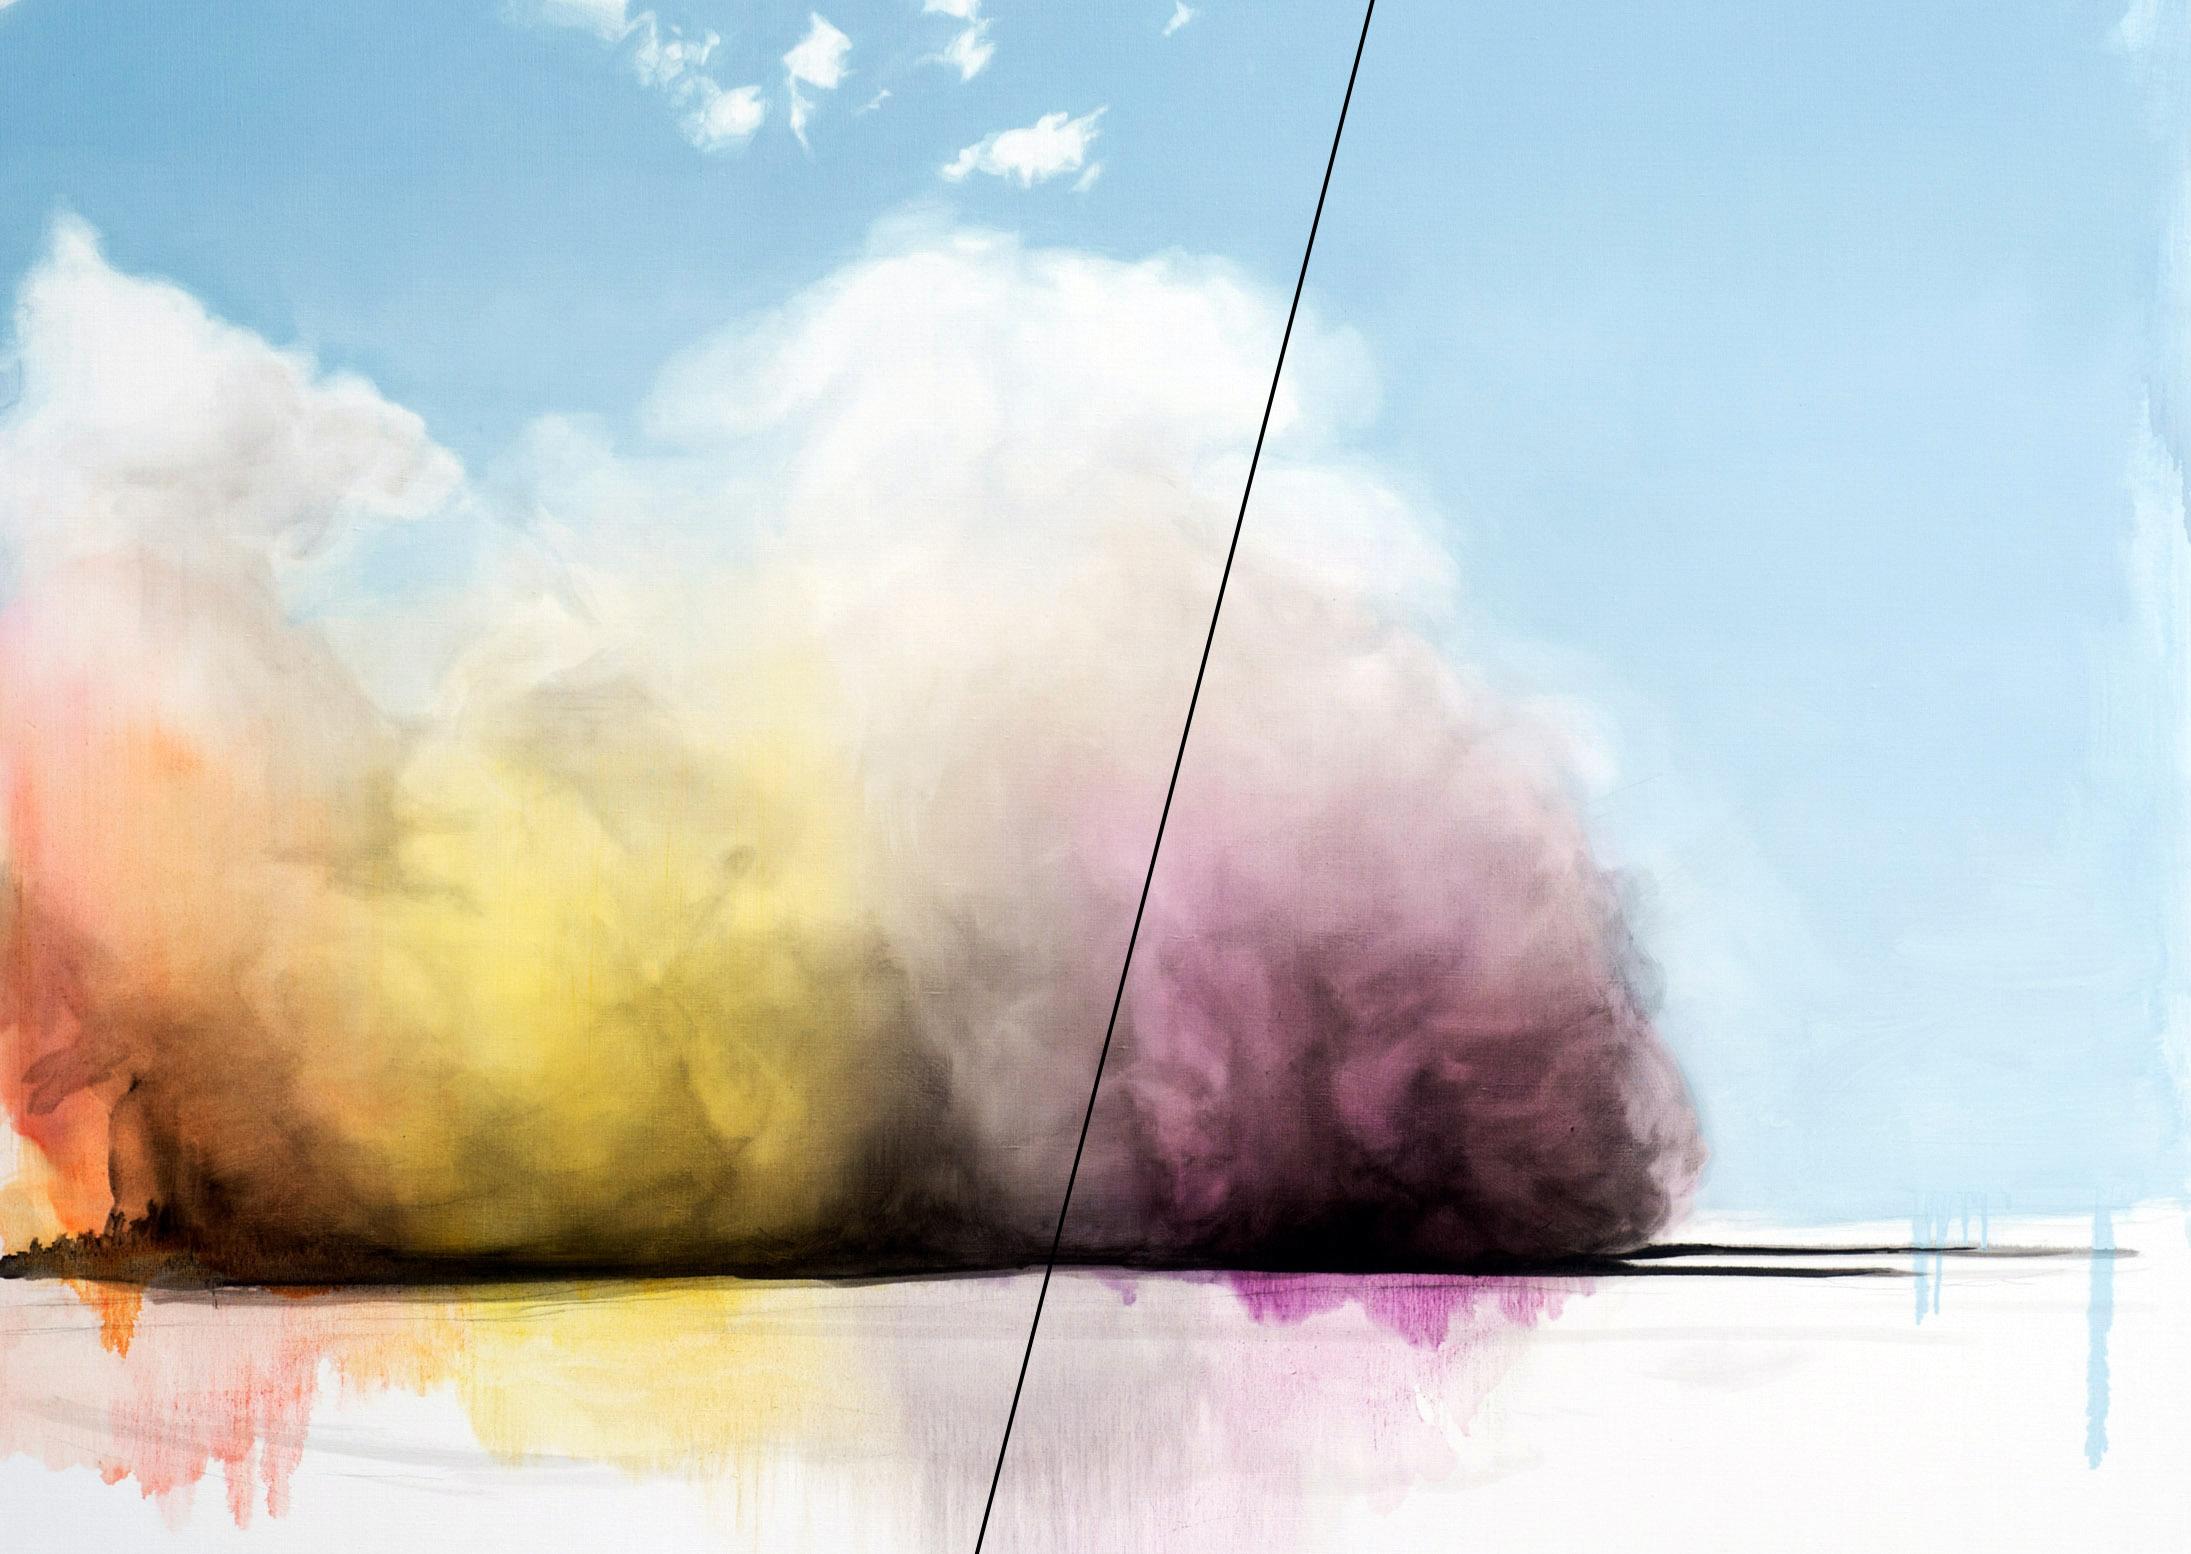 Spectral Dust Cloud / No Blue Skies